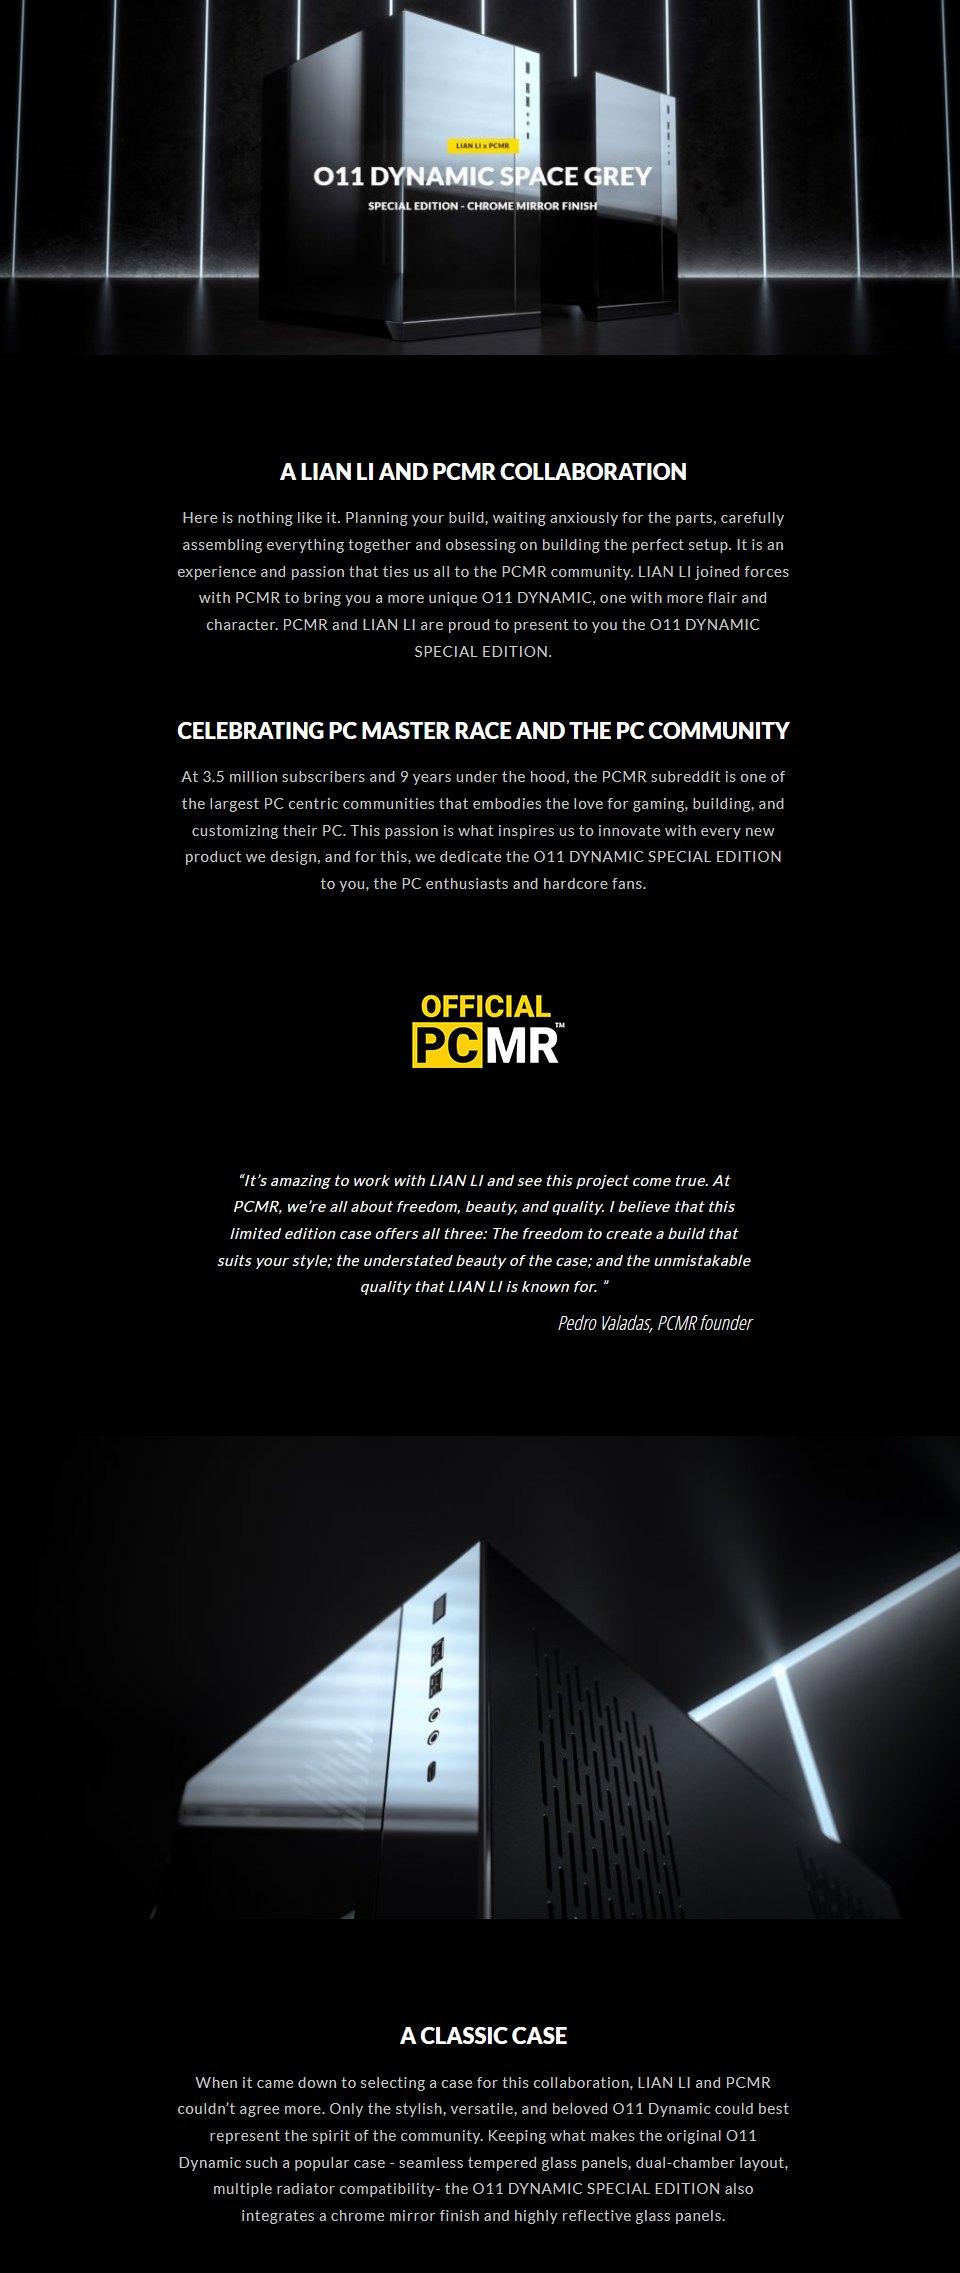 Lian Li PC-O11 Dynamic XL PCMR Limited Edition Case features